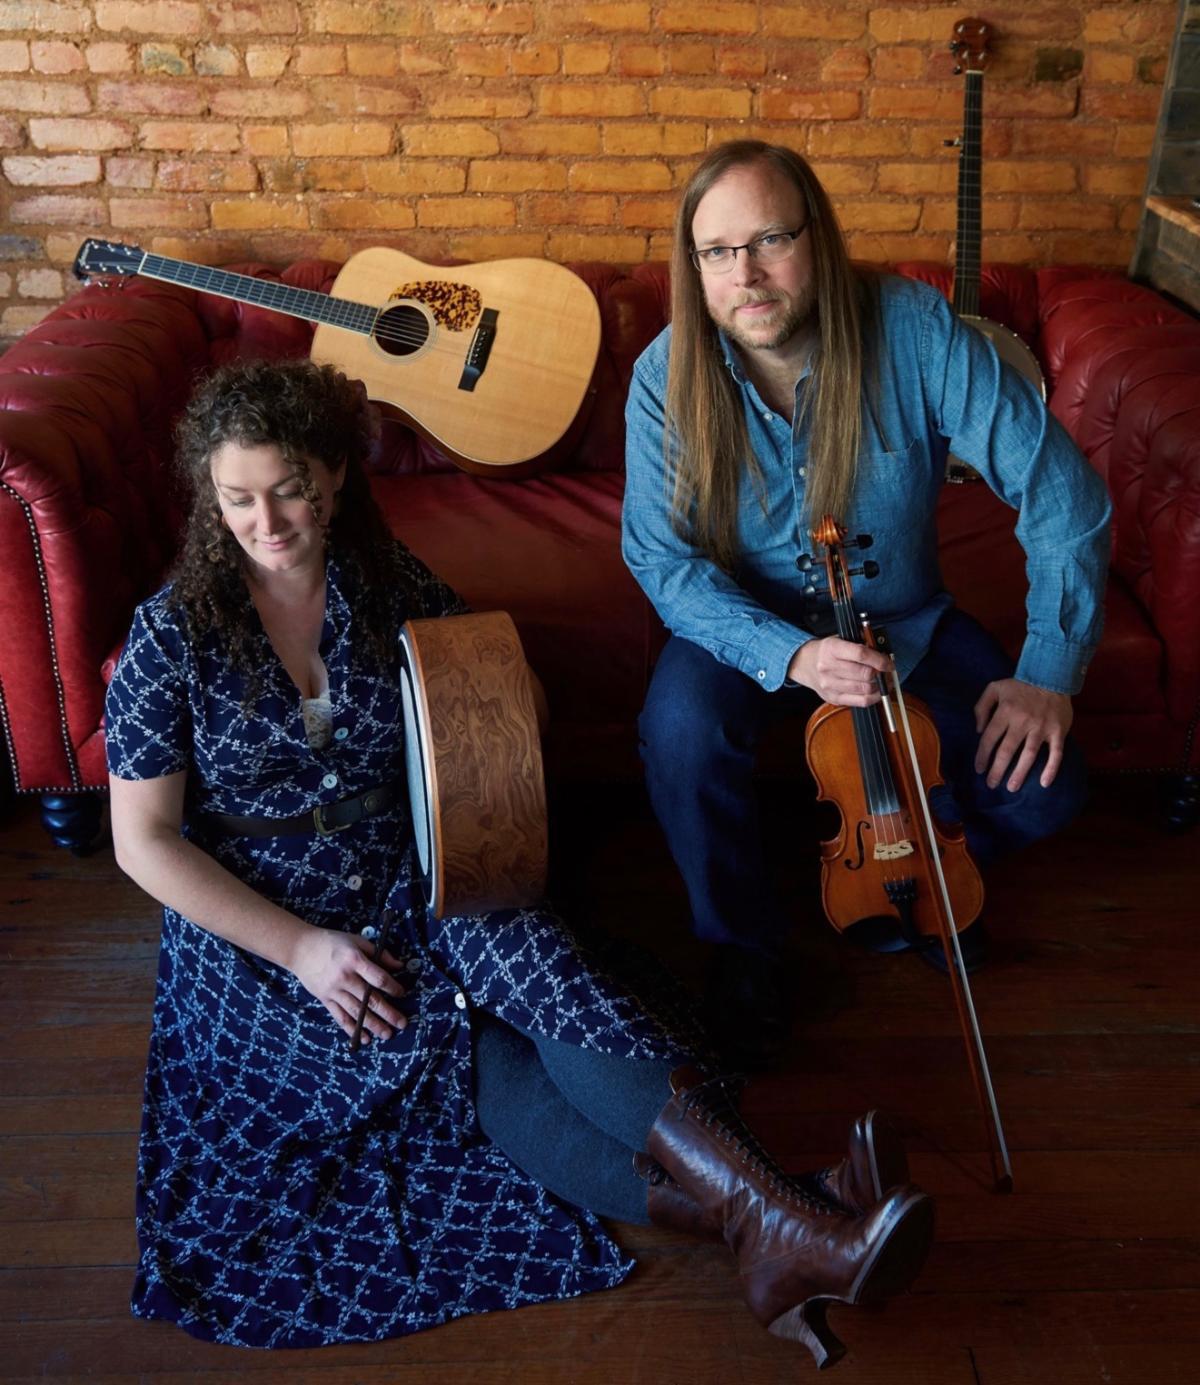 Musicians Tom Eure and Amelia Osborne